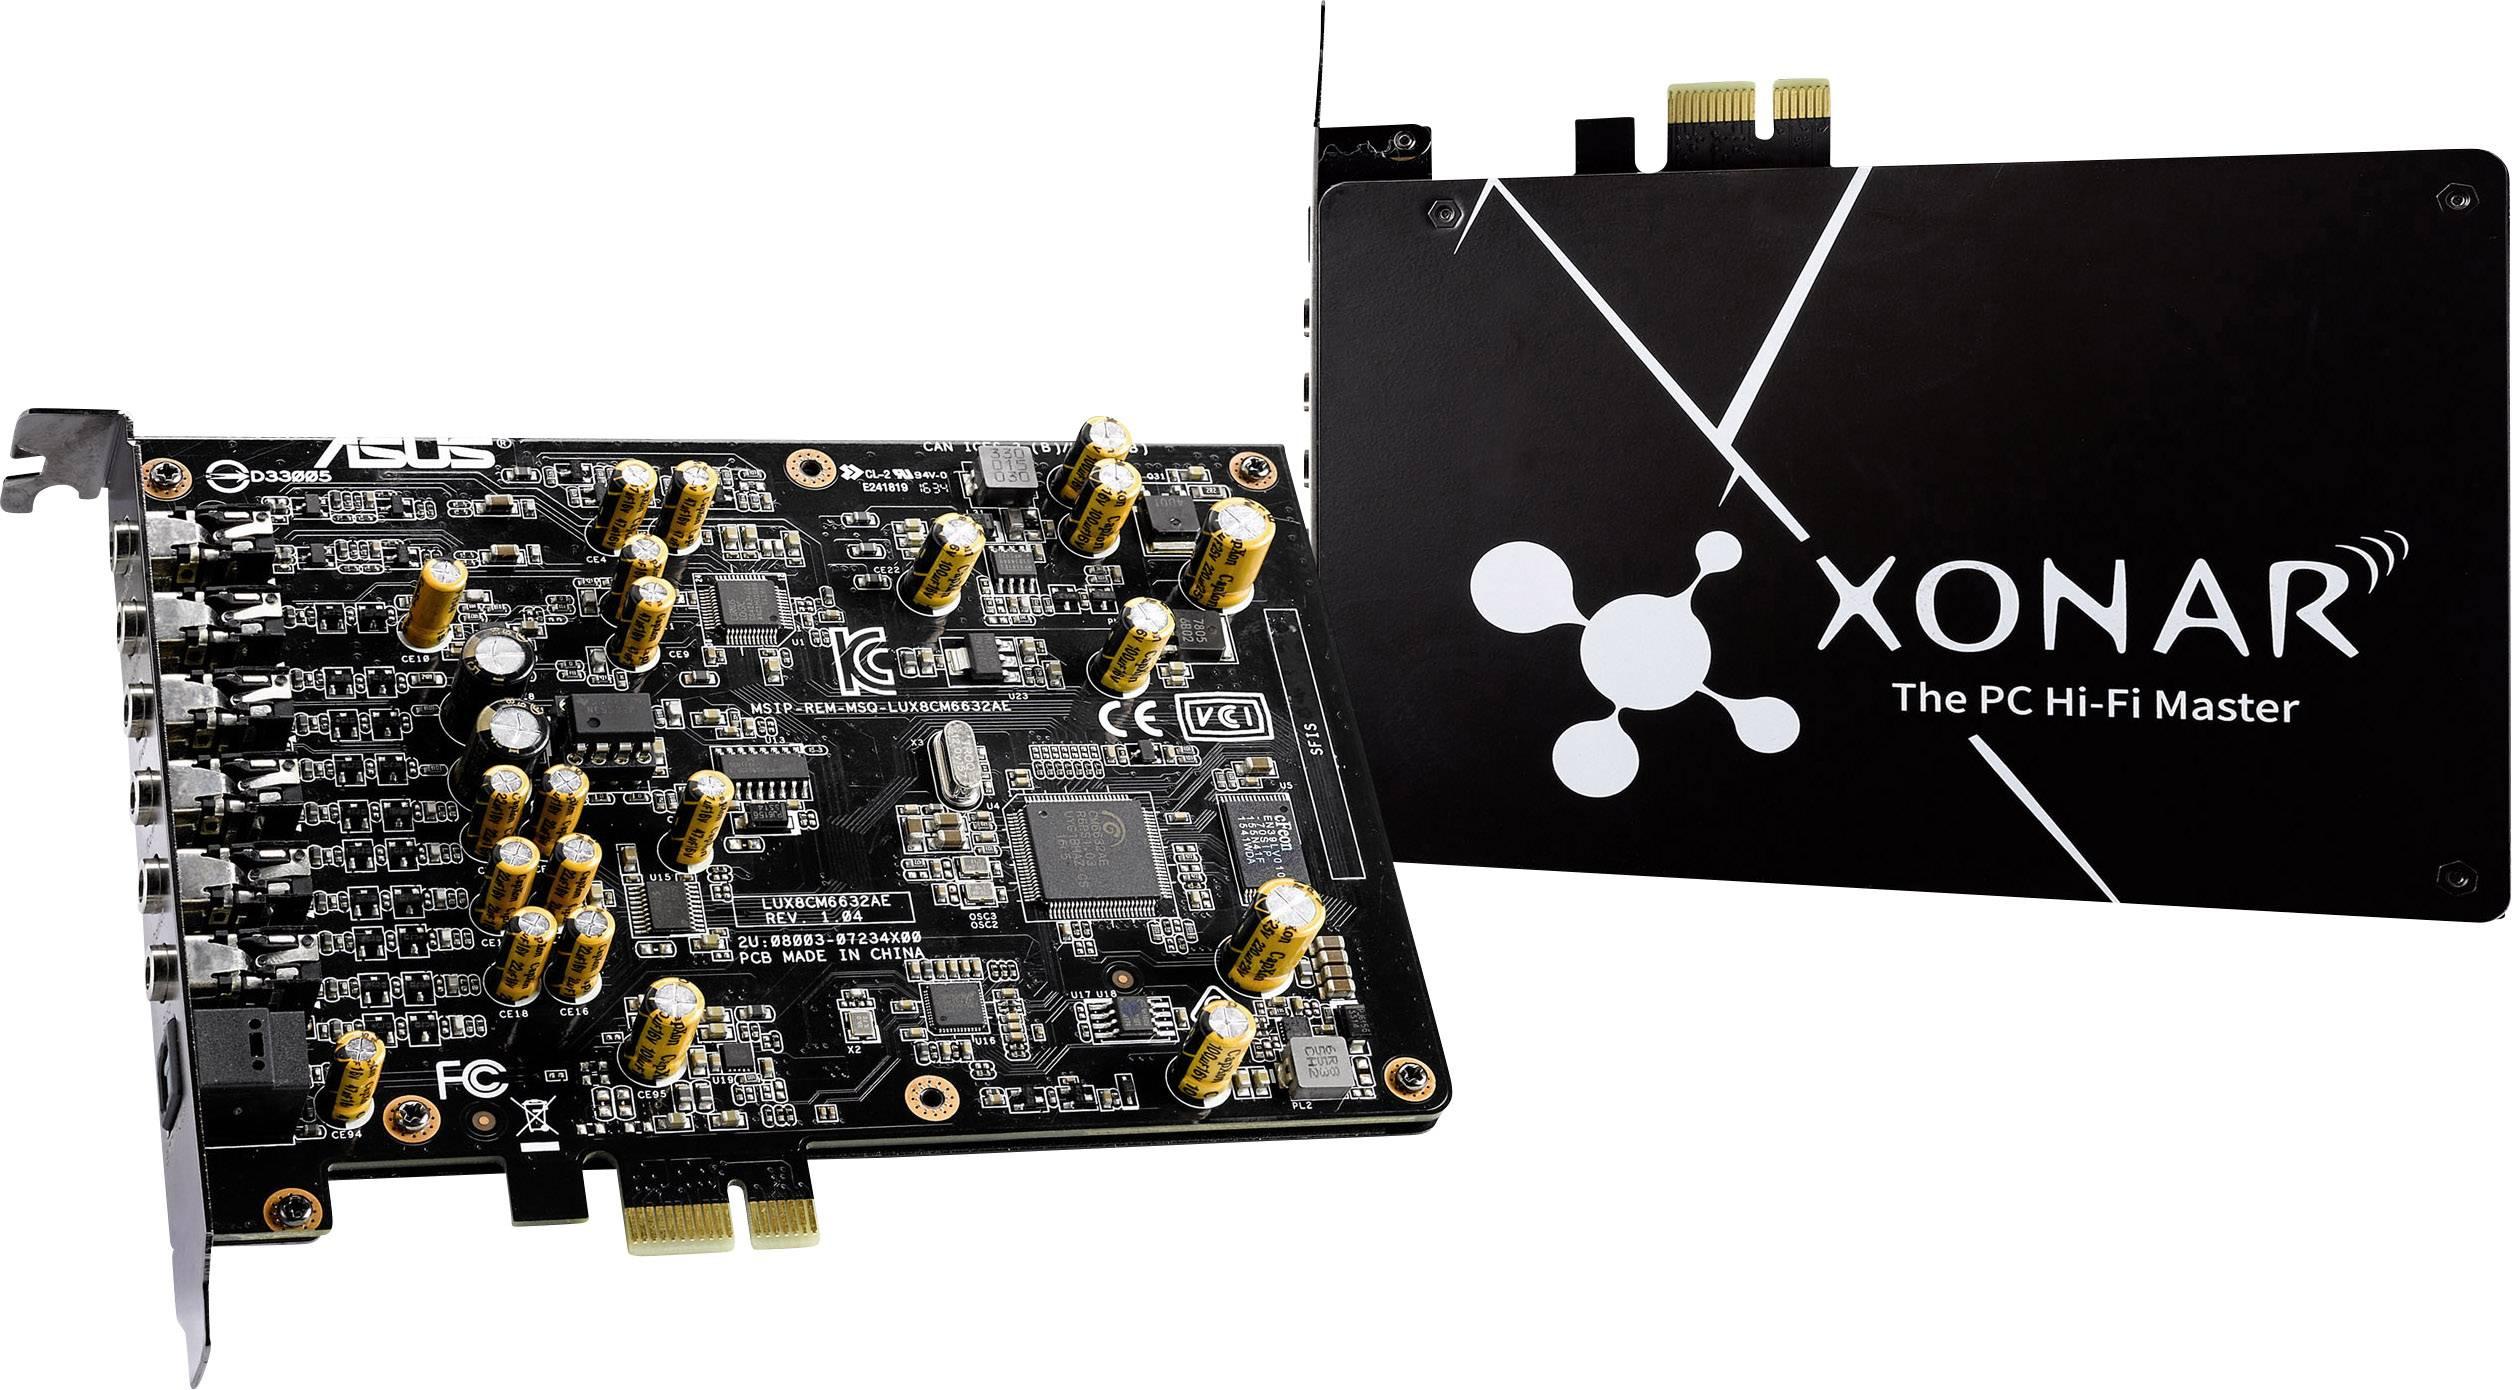 7.1 interní zvuková karta Asus Xonar AE PCIe digitální výstup, externí konektor na sluchátka